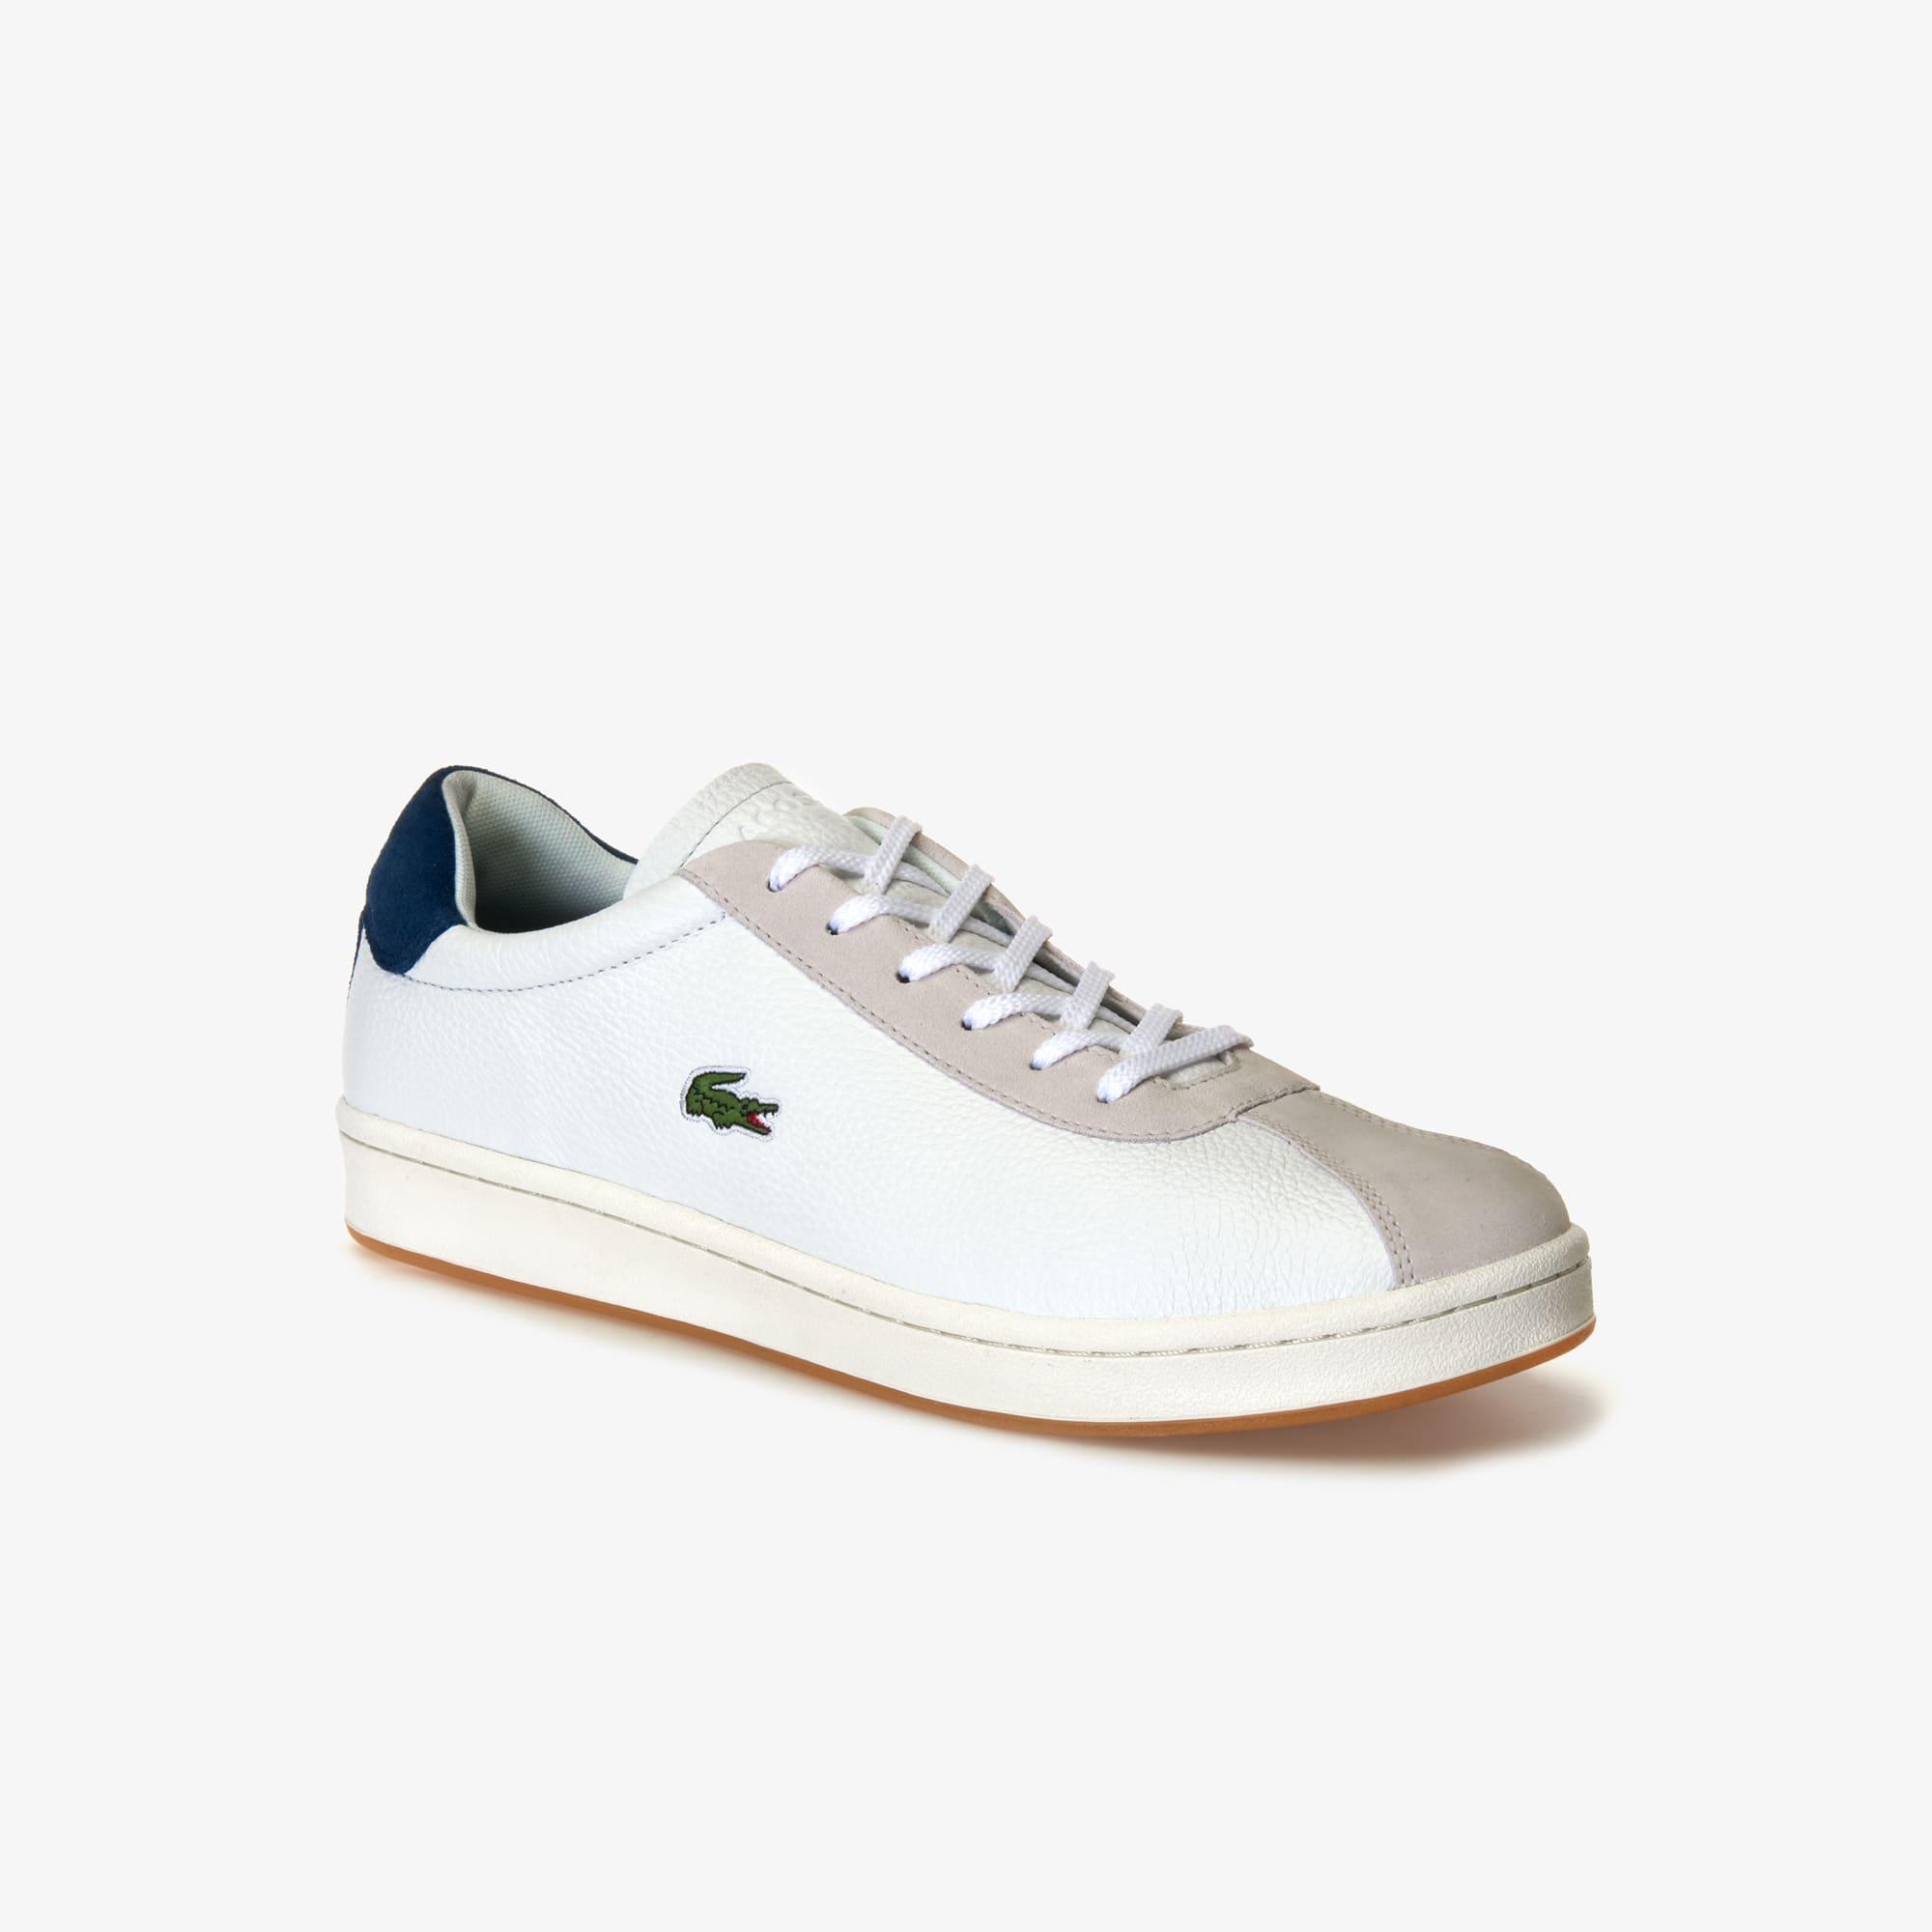 8829e0efed6167 Tutte le scarpe | LACOSTE